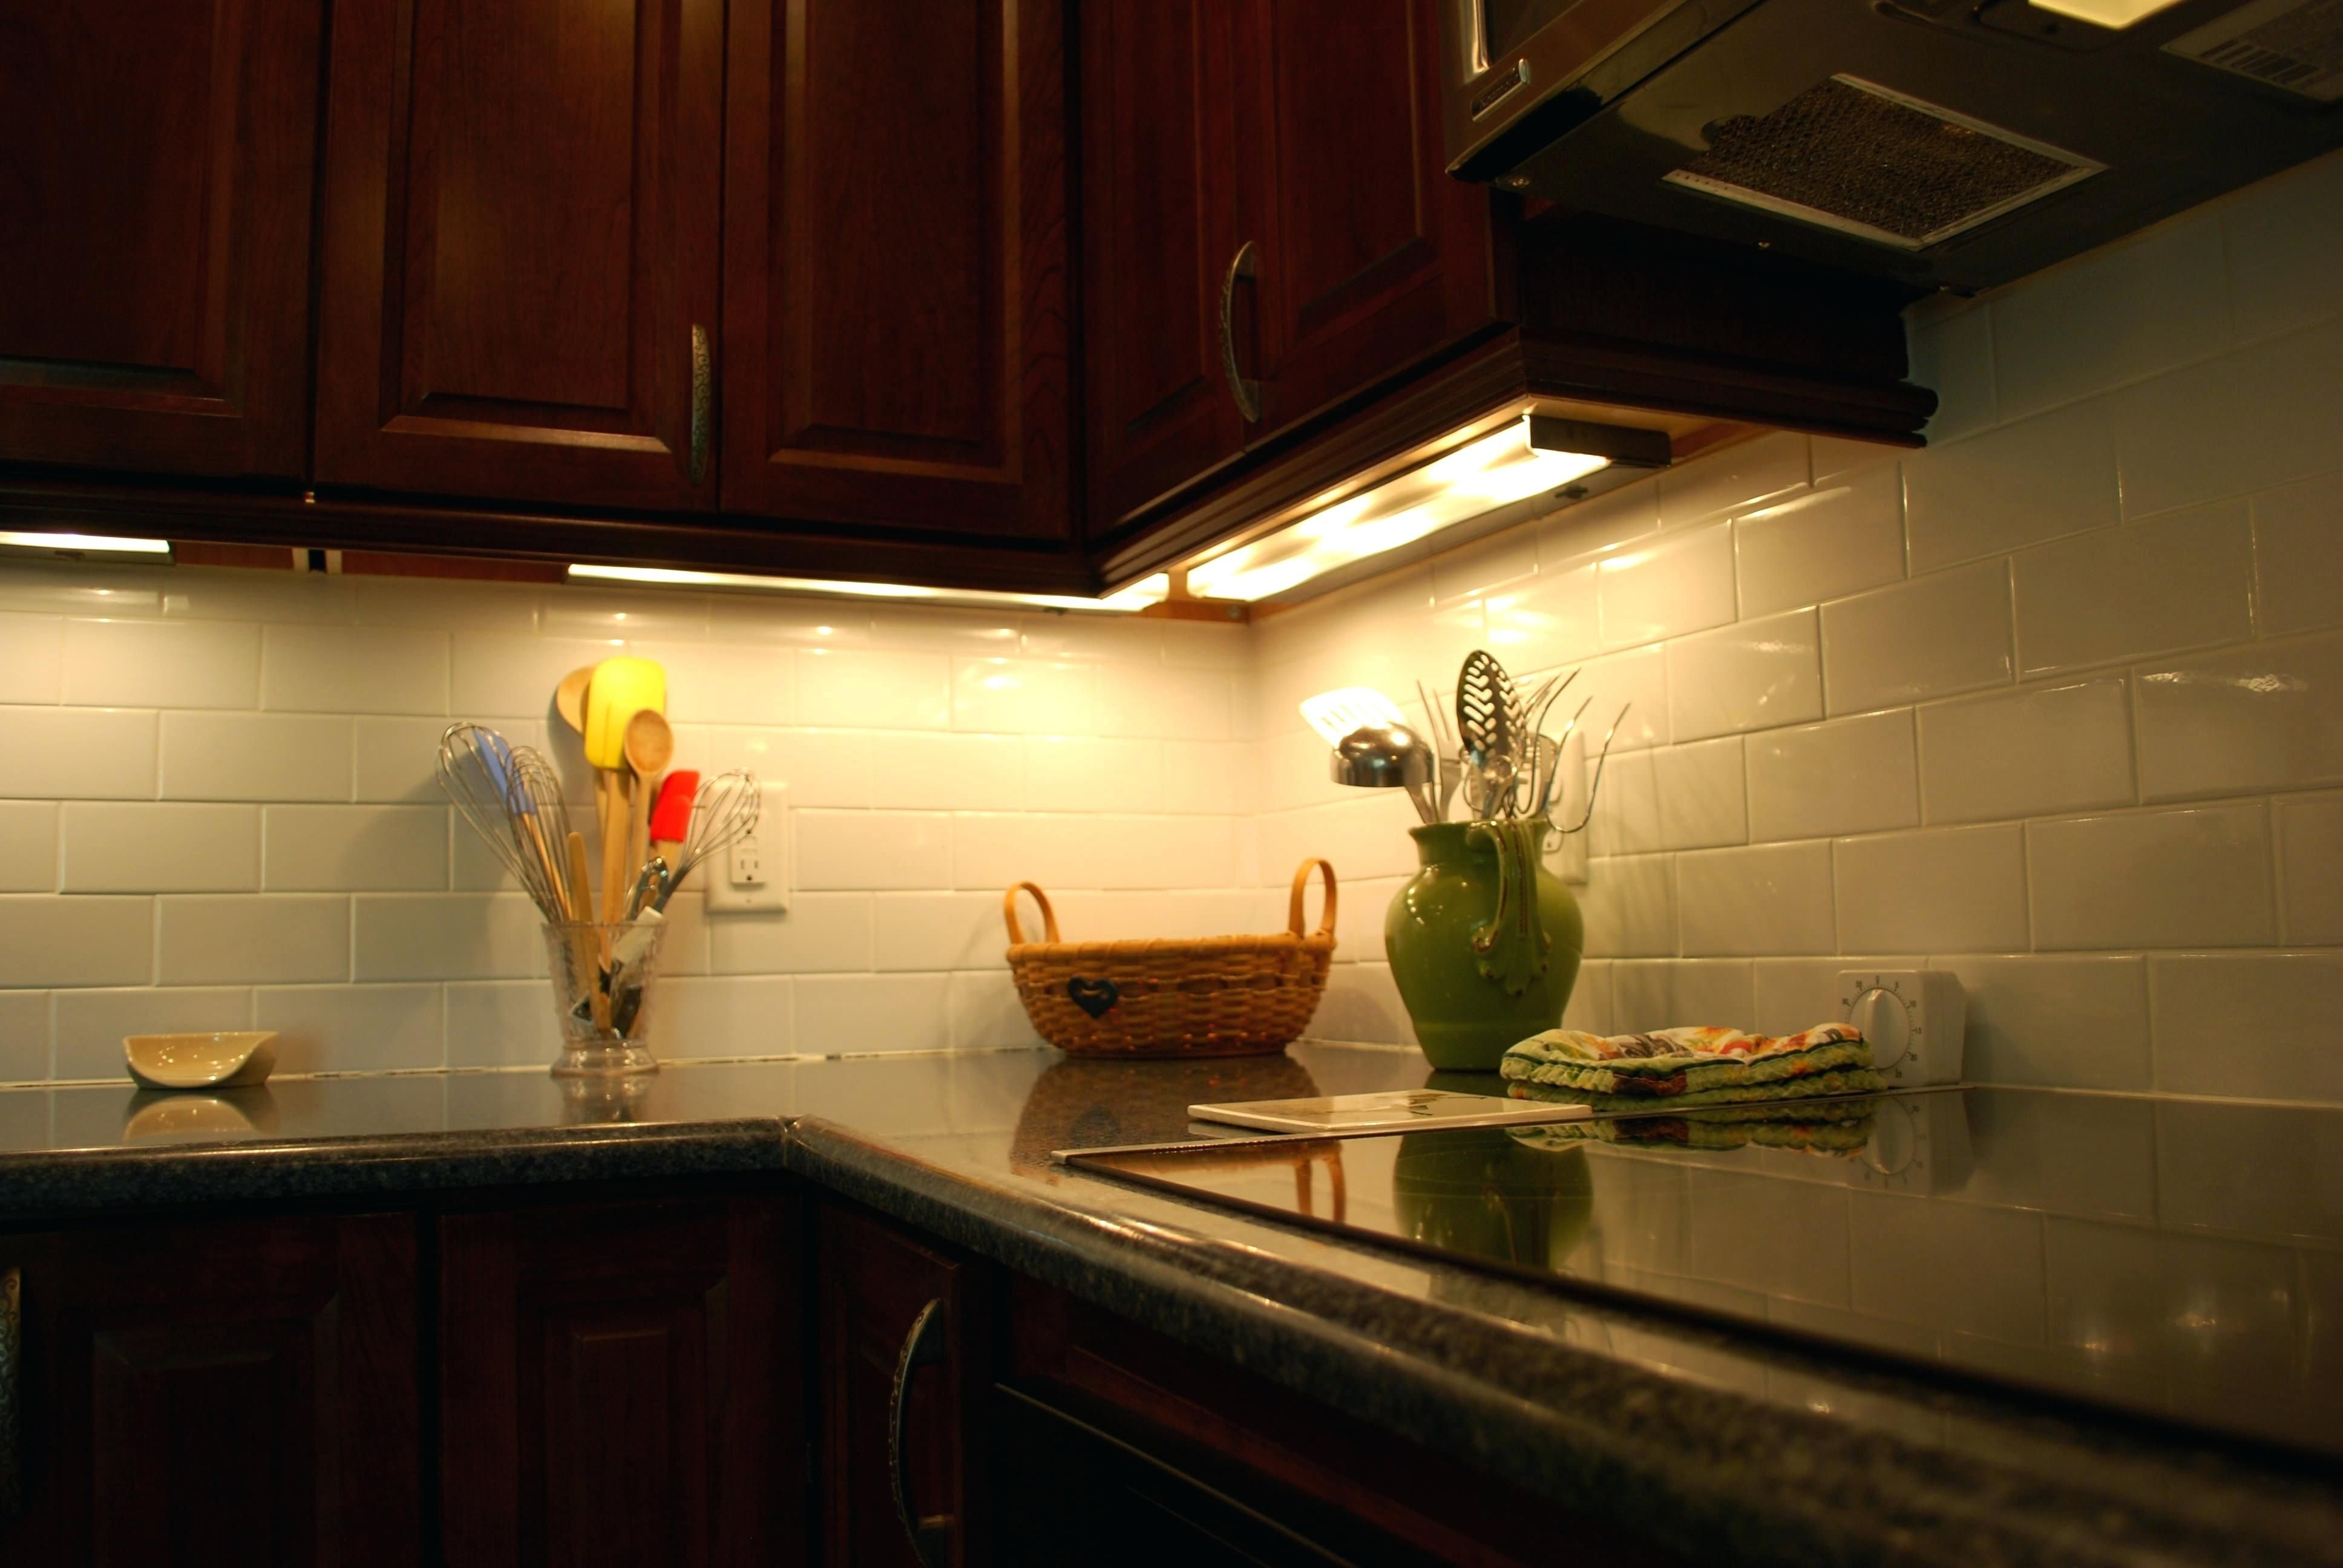 Beau The Amazing Kichler Design Pro Led Under Cabinet Lighting Fixtures For Dream